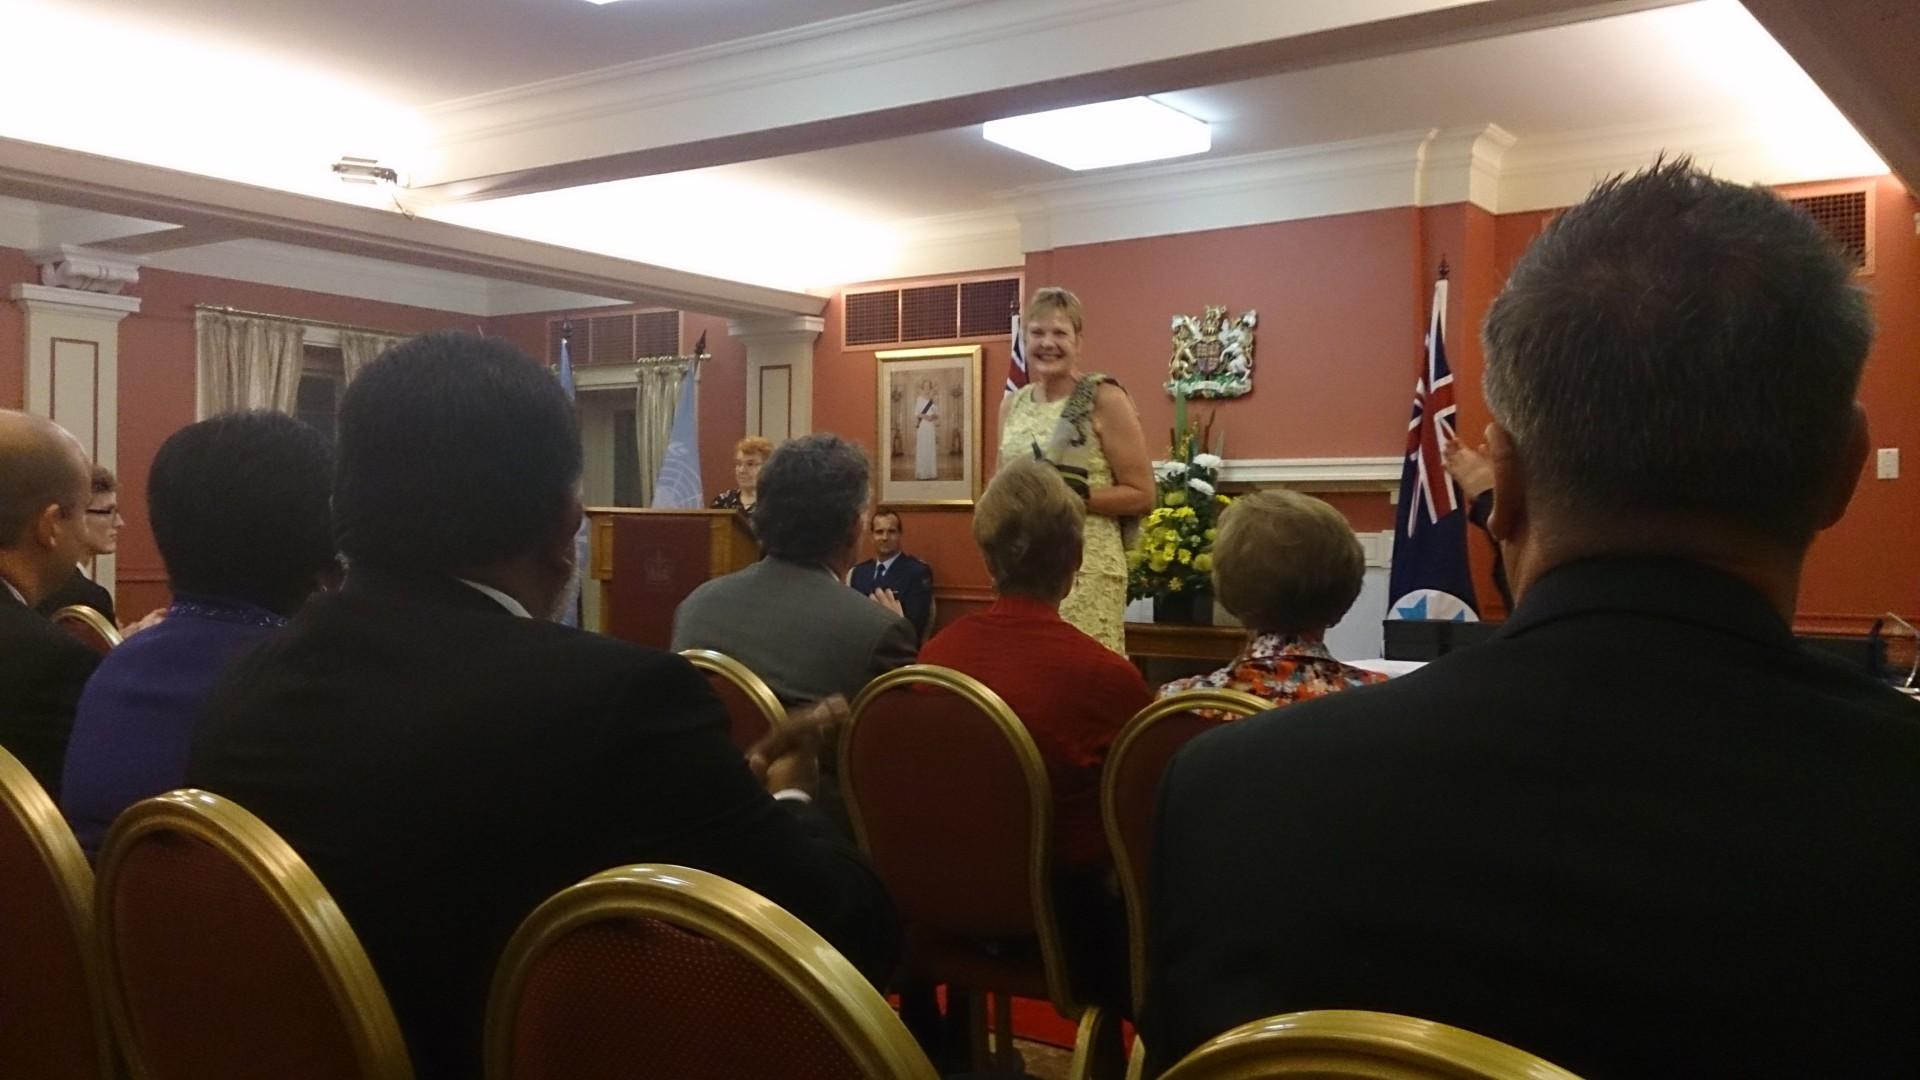 Judi accepts the UN Community award on behalf of the Zonta Club of Brisbane Breakfast.